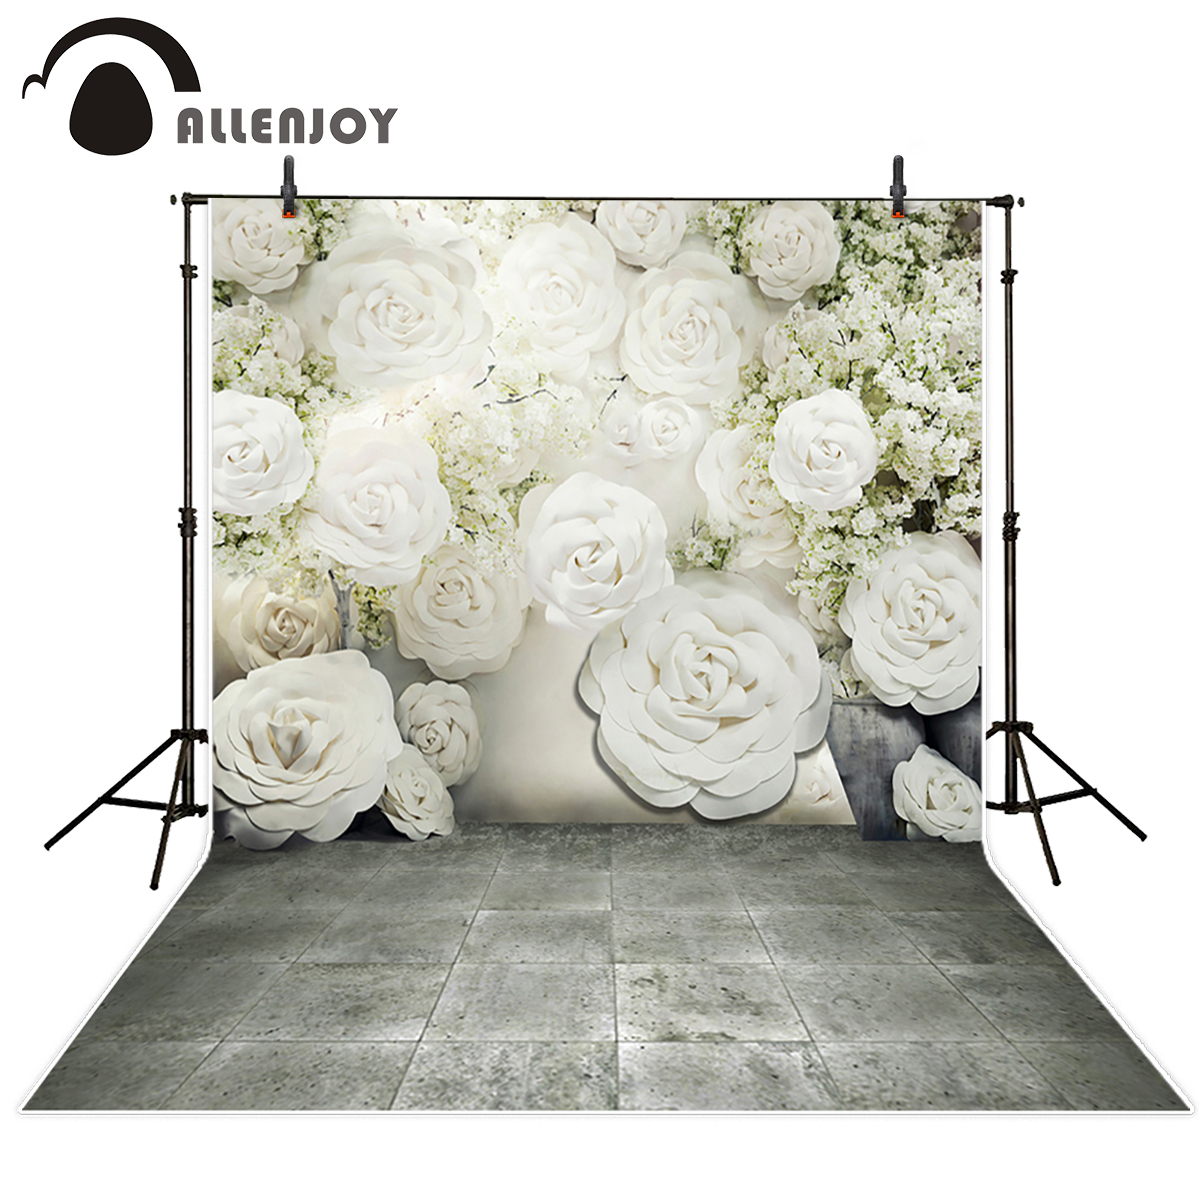 Allenjoy Photography Backdrops White Flowers Wedding